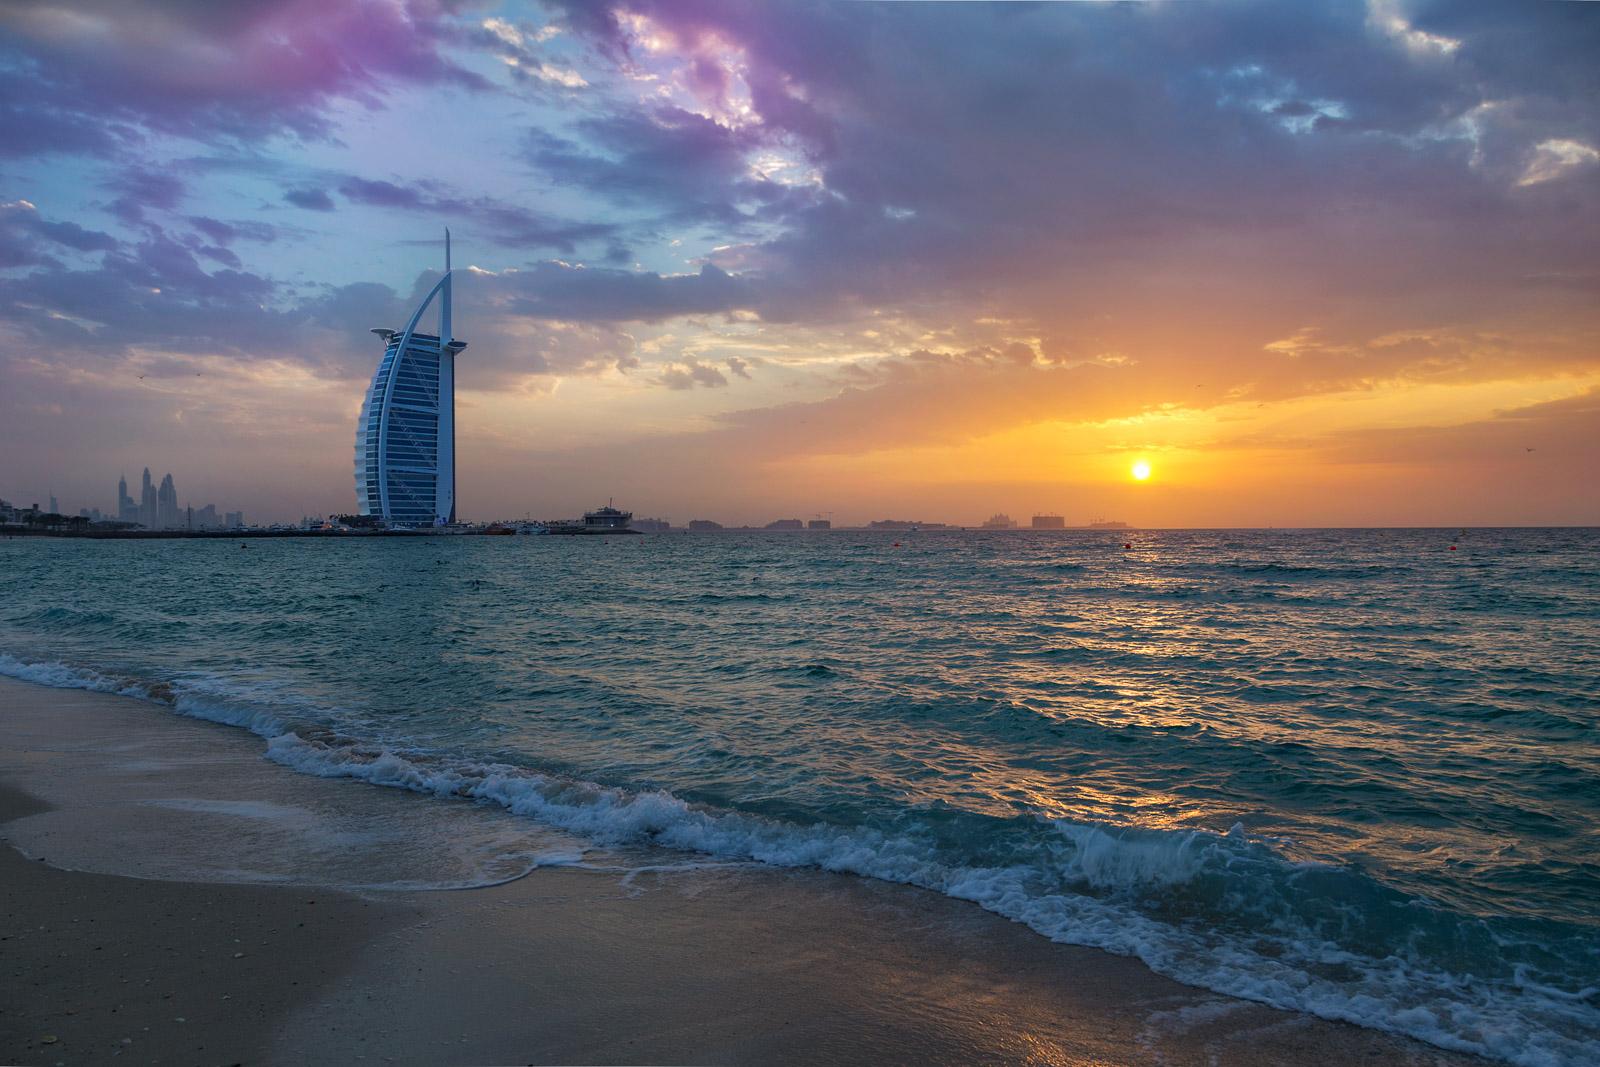 Burj Arab 9959